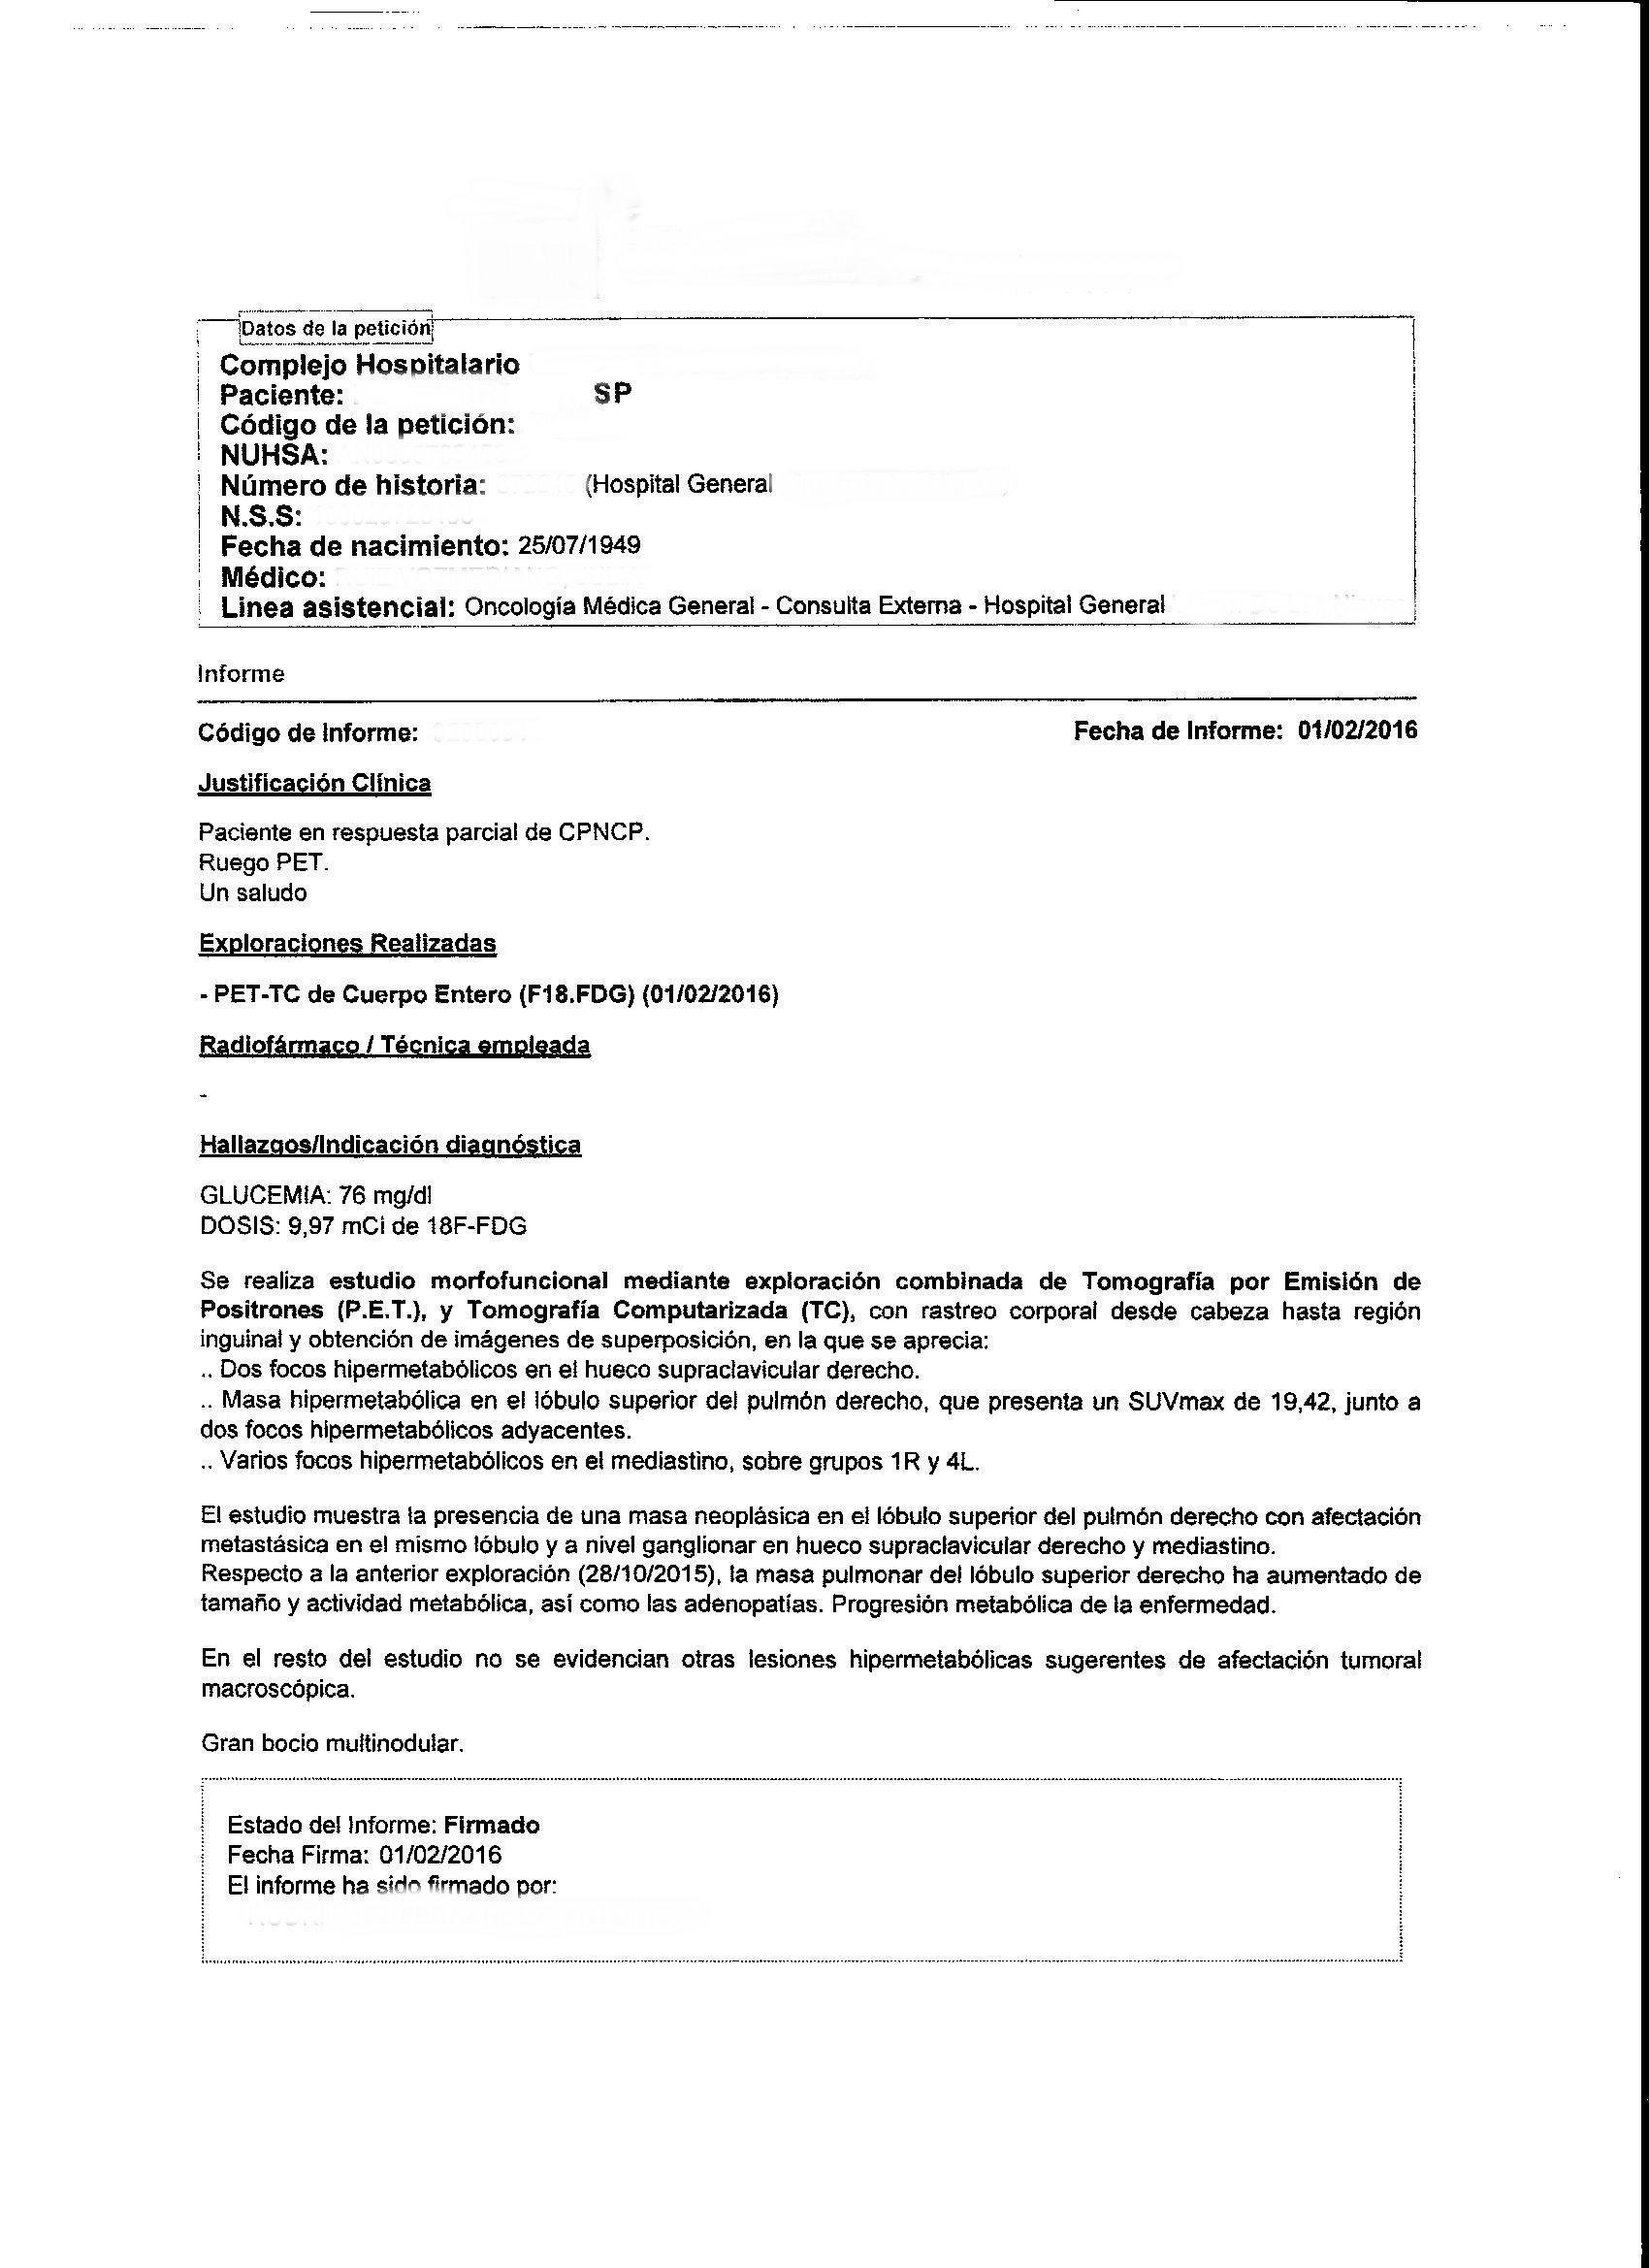 LifEscozul® - S.P. 5 - Cáncer de Pulmon